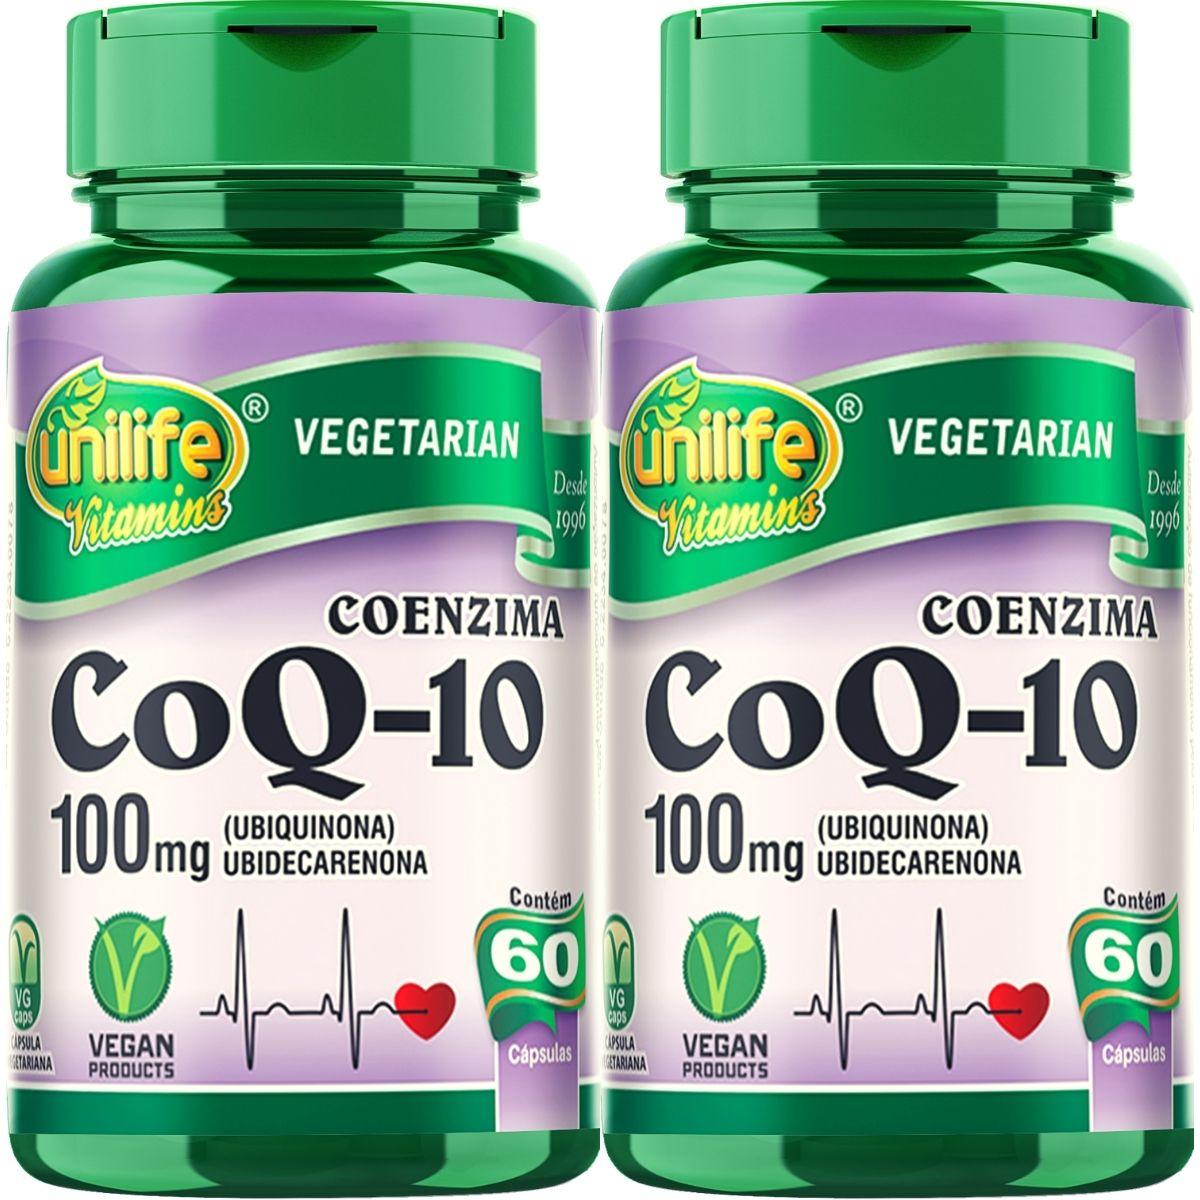 Kit 2 Coenzima Q10 100mg 60 Cápsulas - Unilife